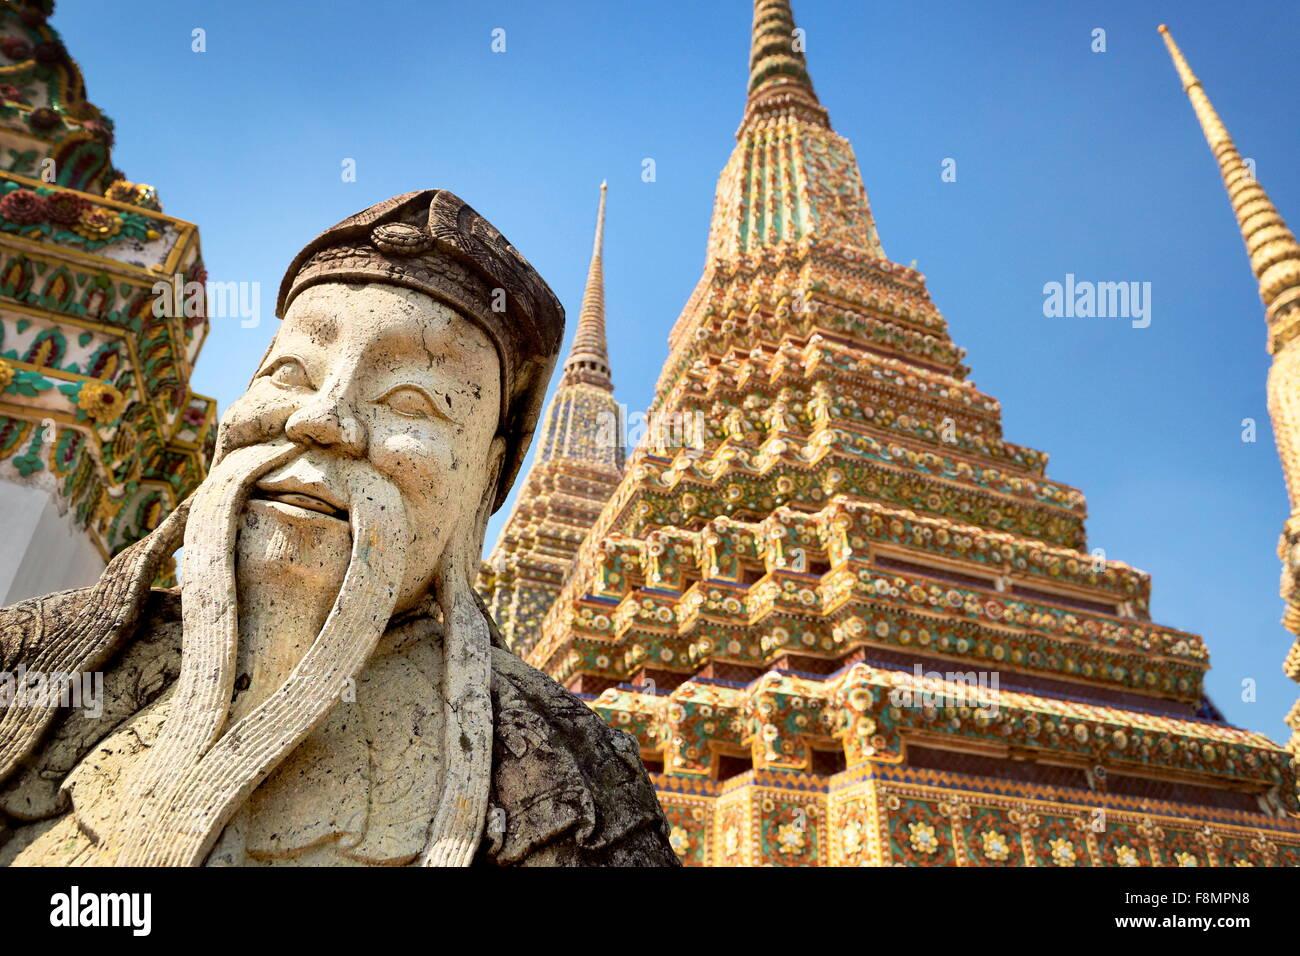 Thailandia - Bangkok, Wat Phra Kaeo tempio, il Grand Palace, statua di pietra Immagini Stock